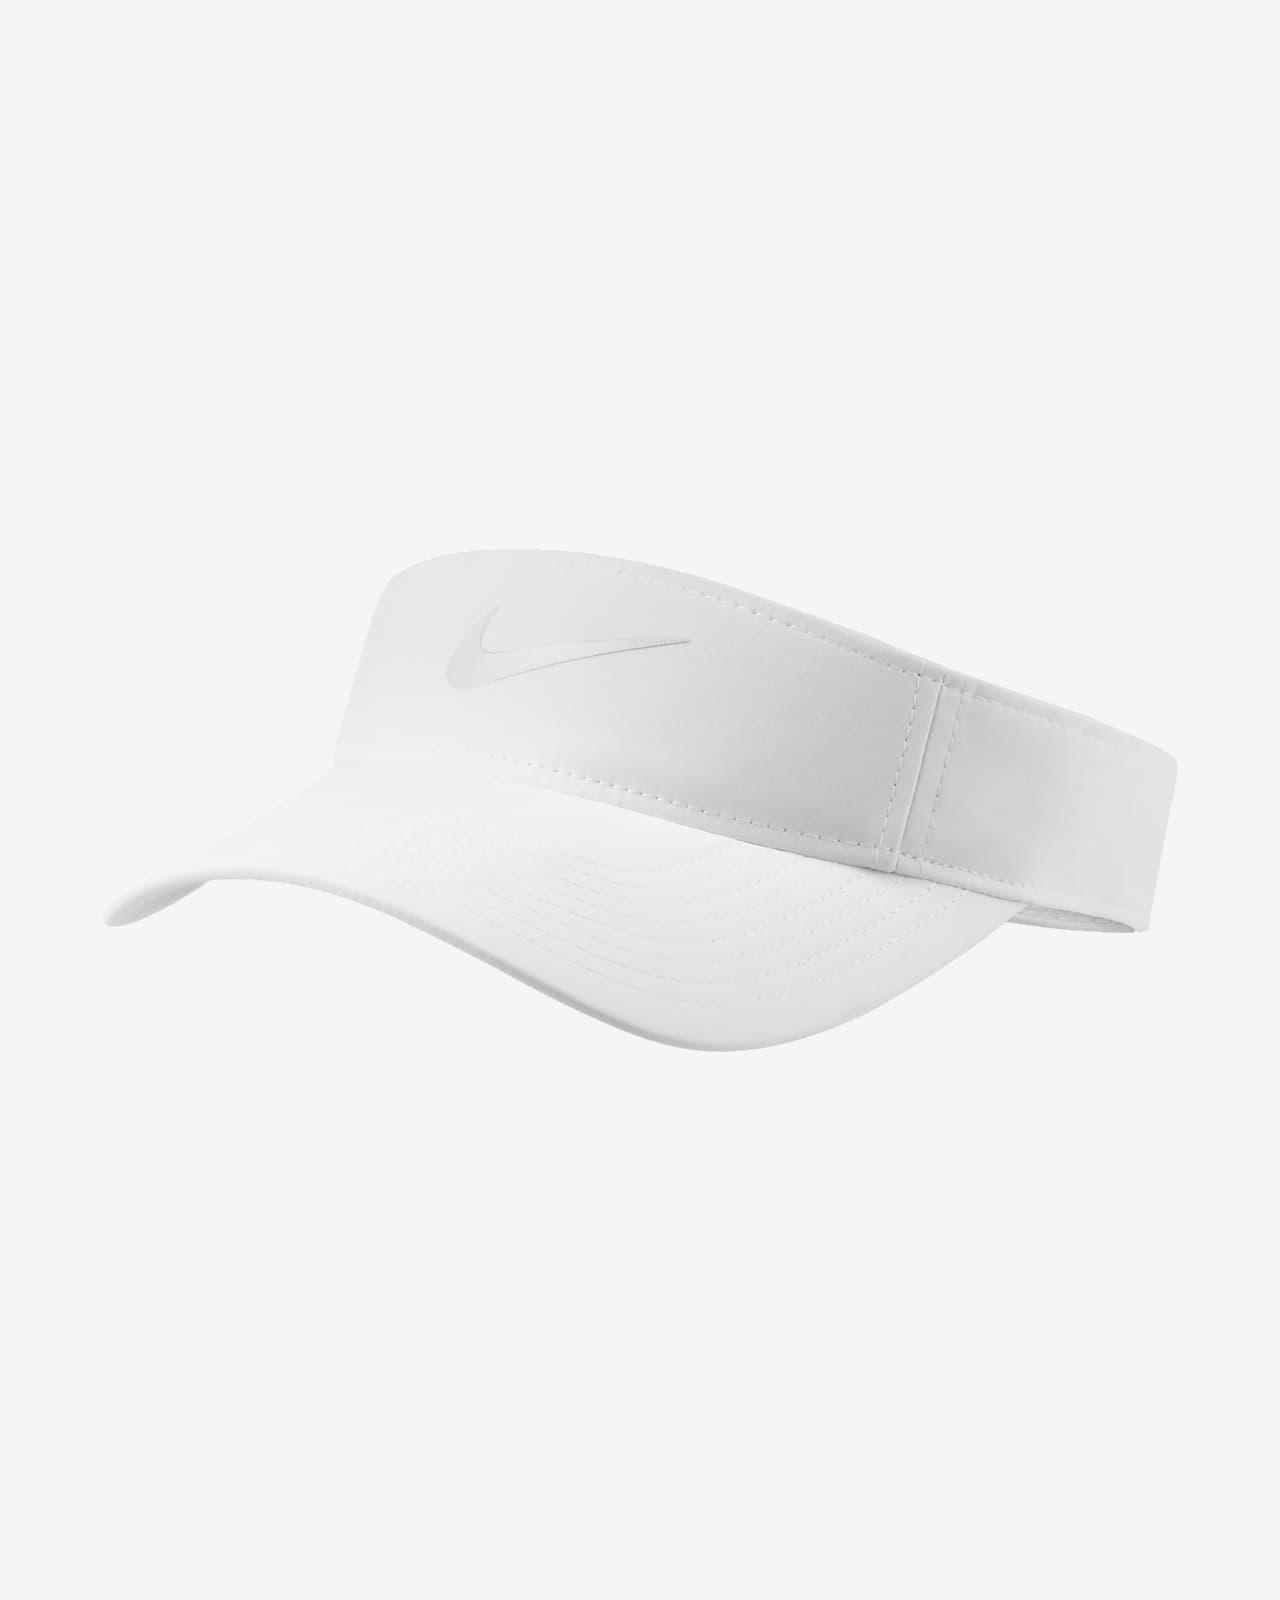 Nike Sportswear 女子遮阳帽